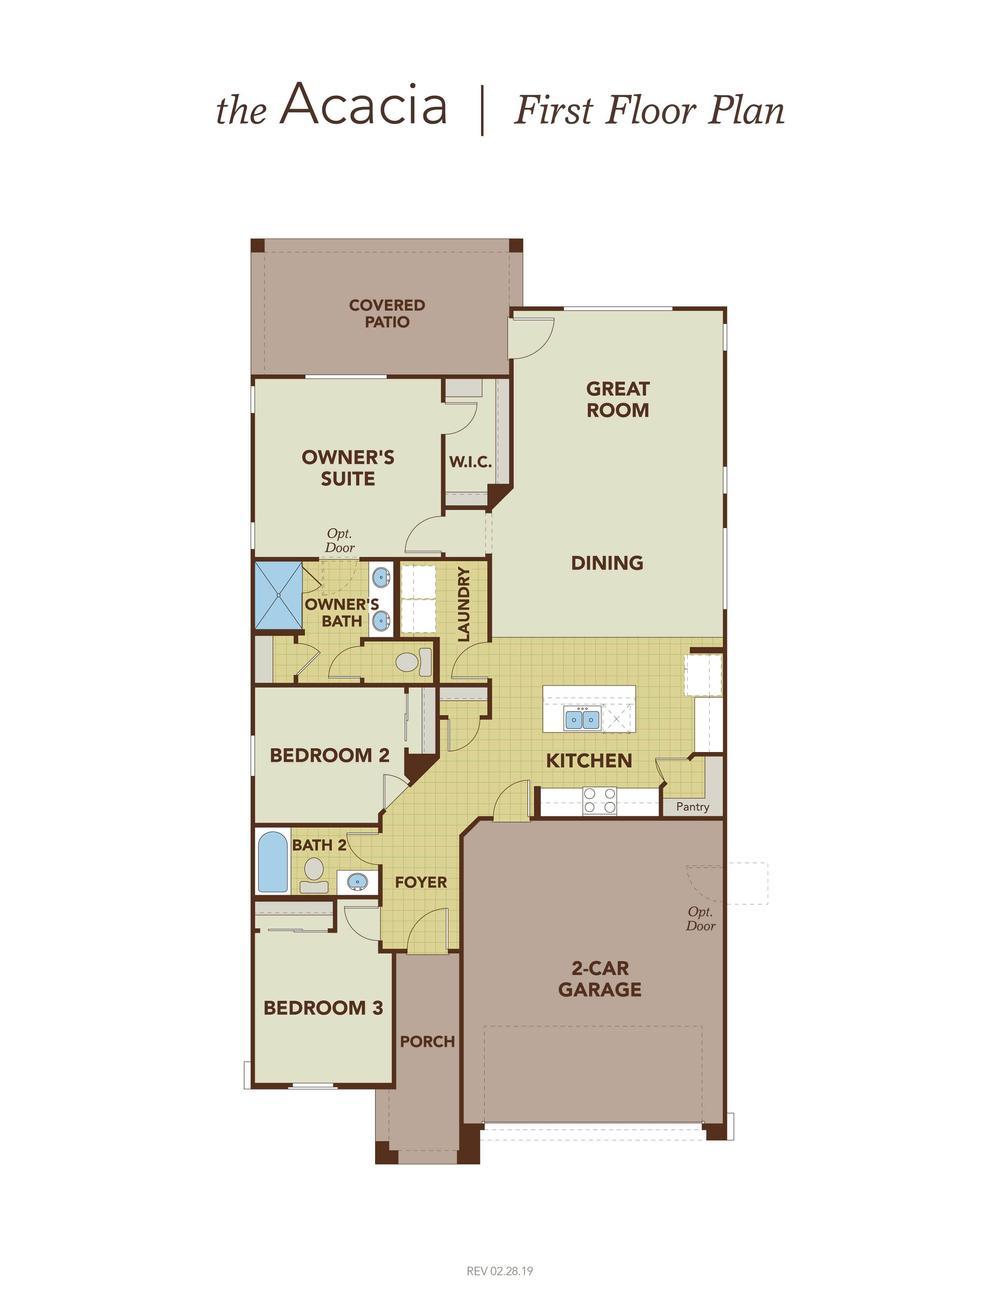 Acacia First Floor Plan